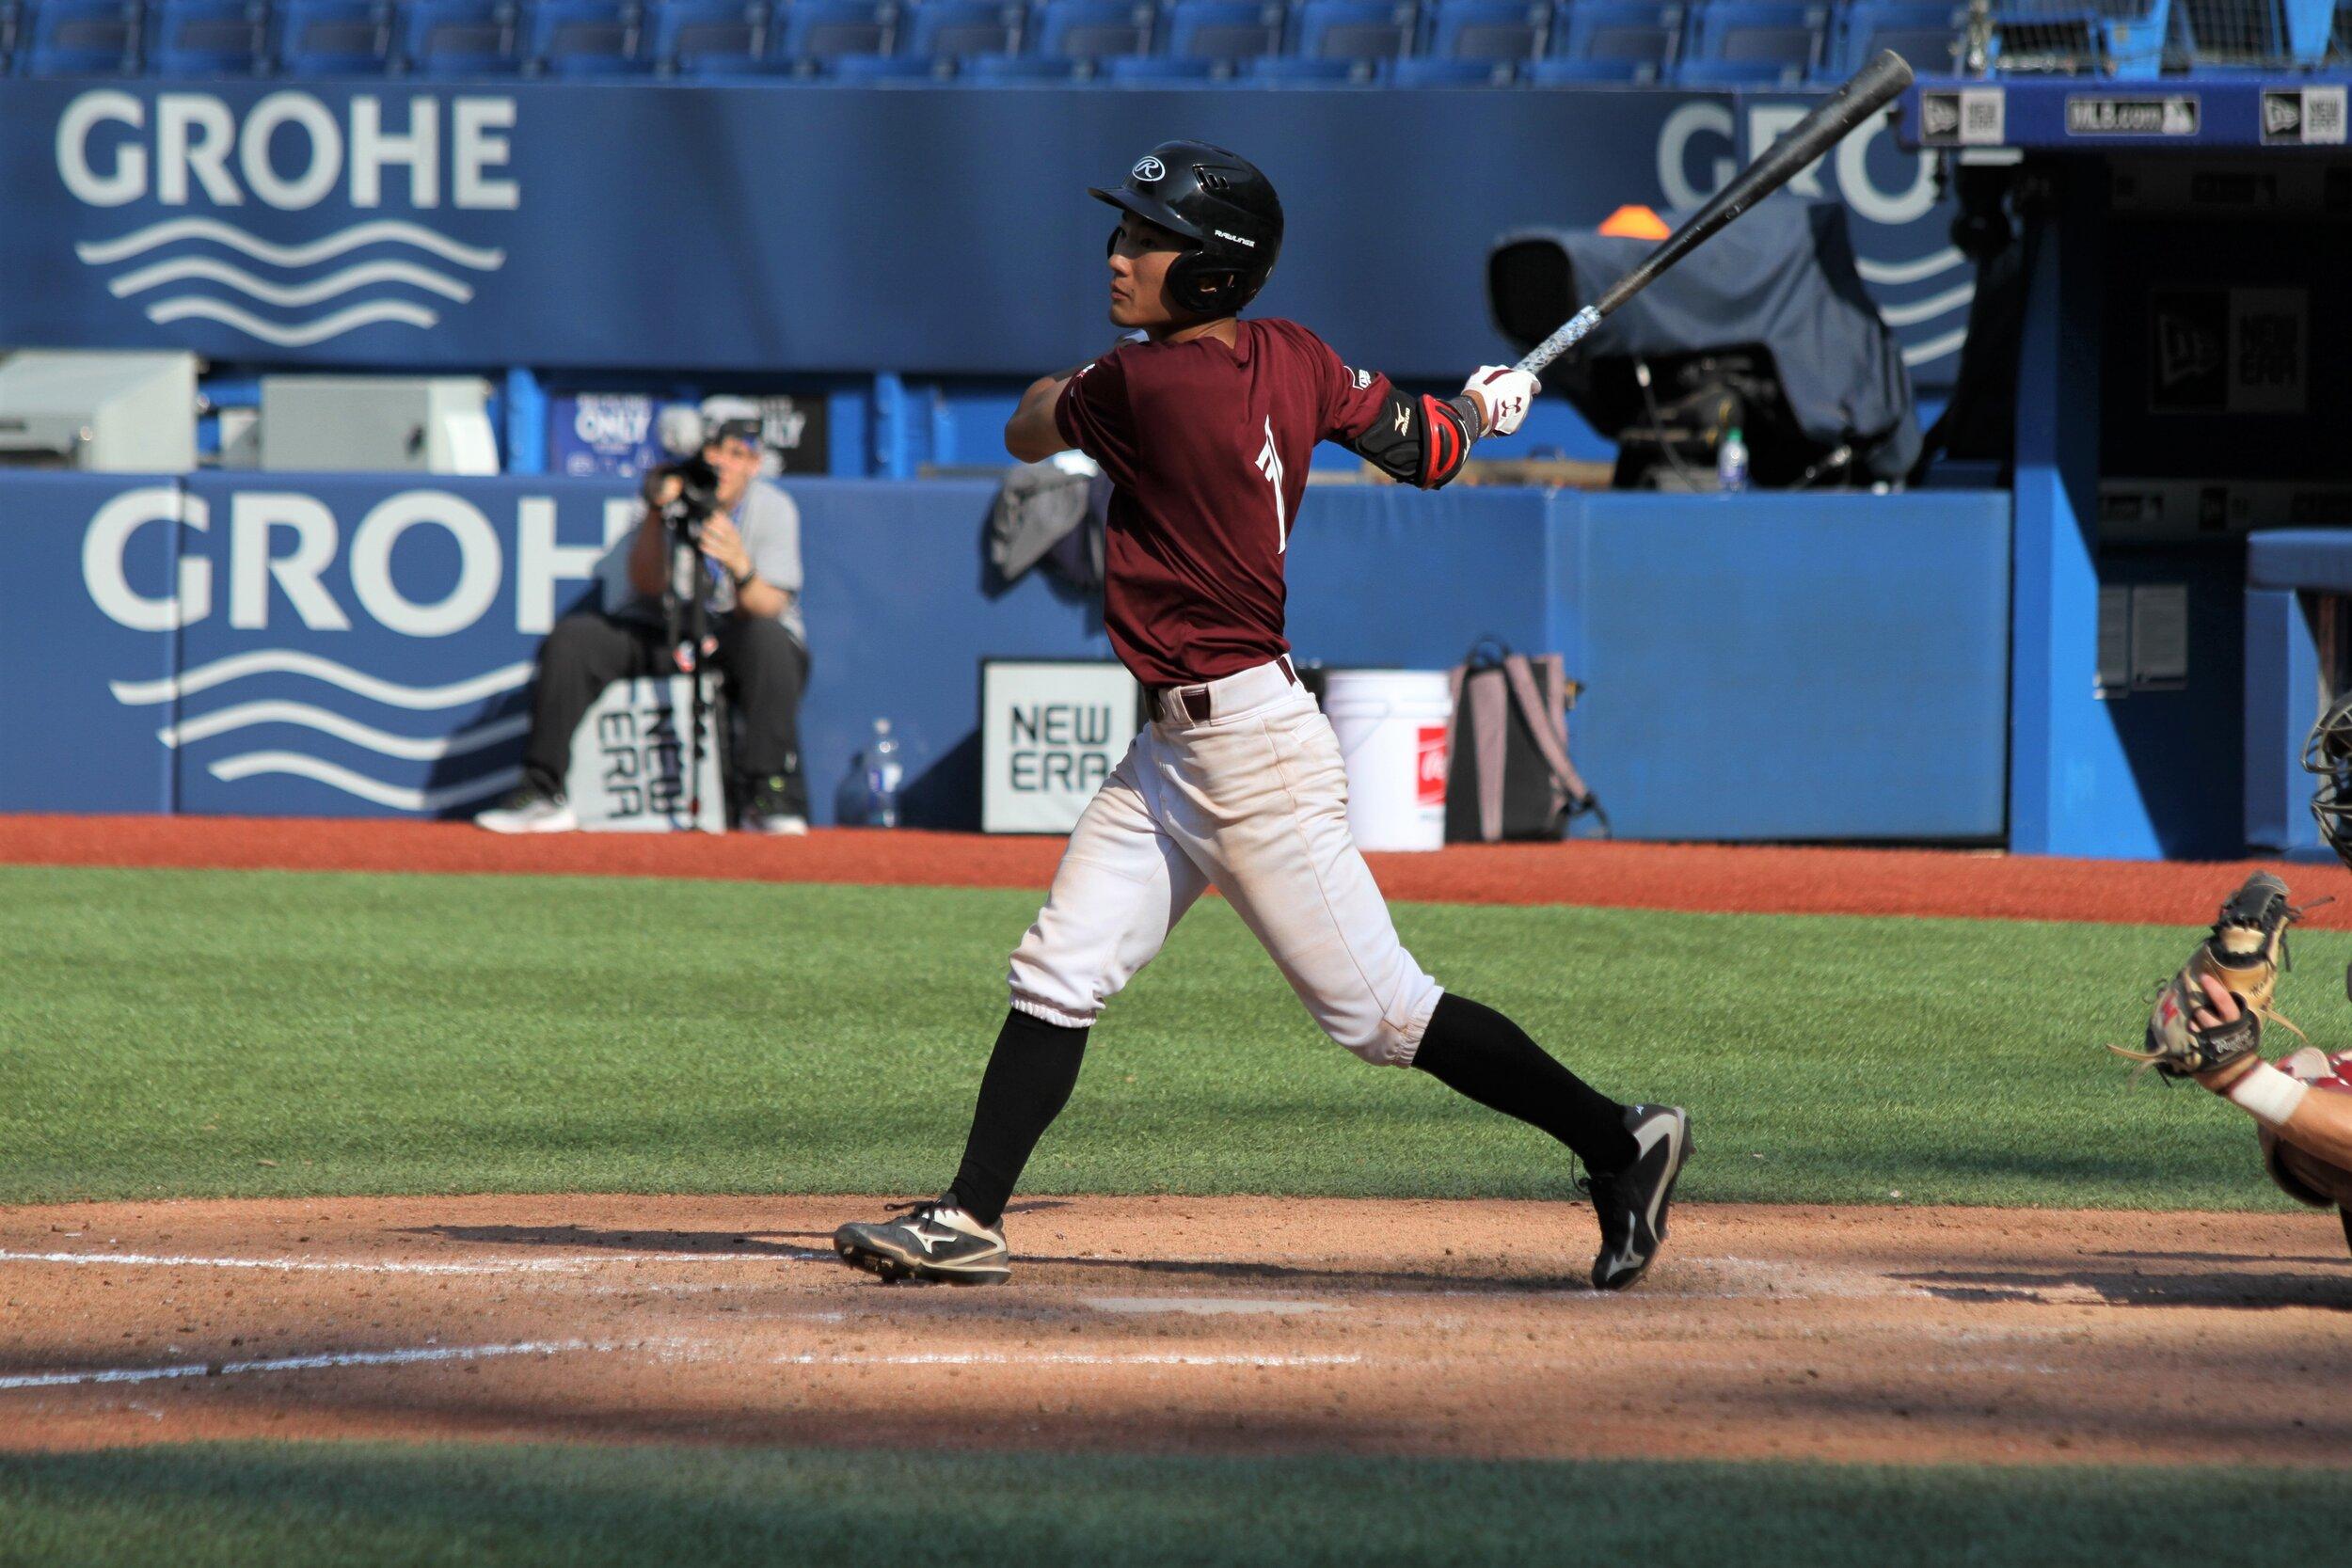 Yosuke Fujie was chosen to take part in the T12 Prospects Game on Saturday. Photo: J.P. Antonacci